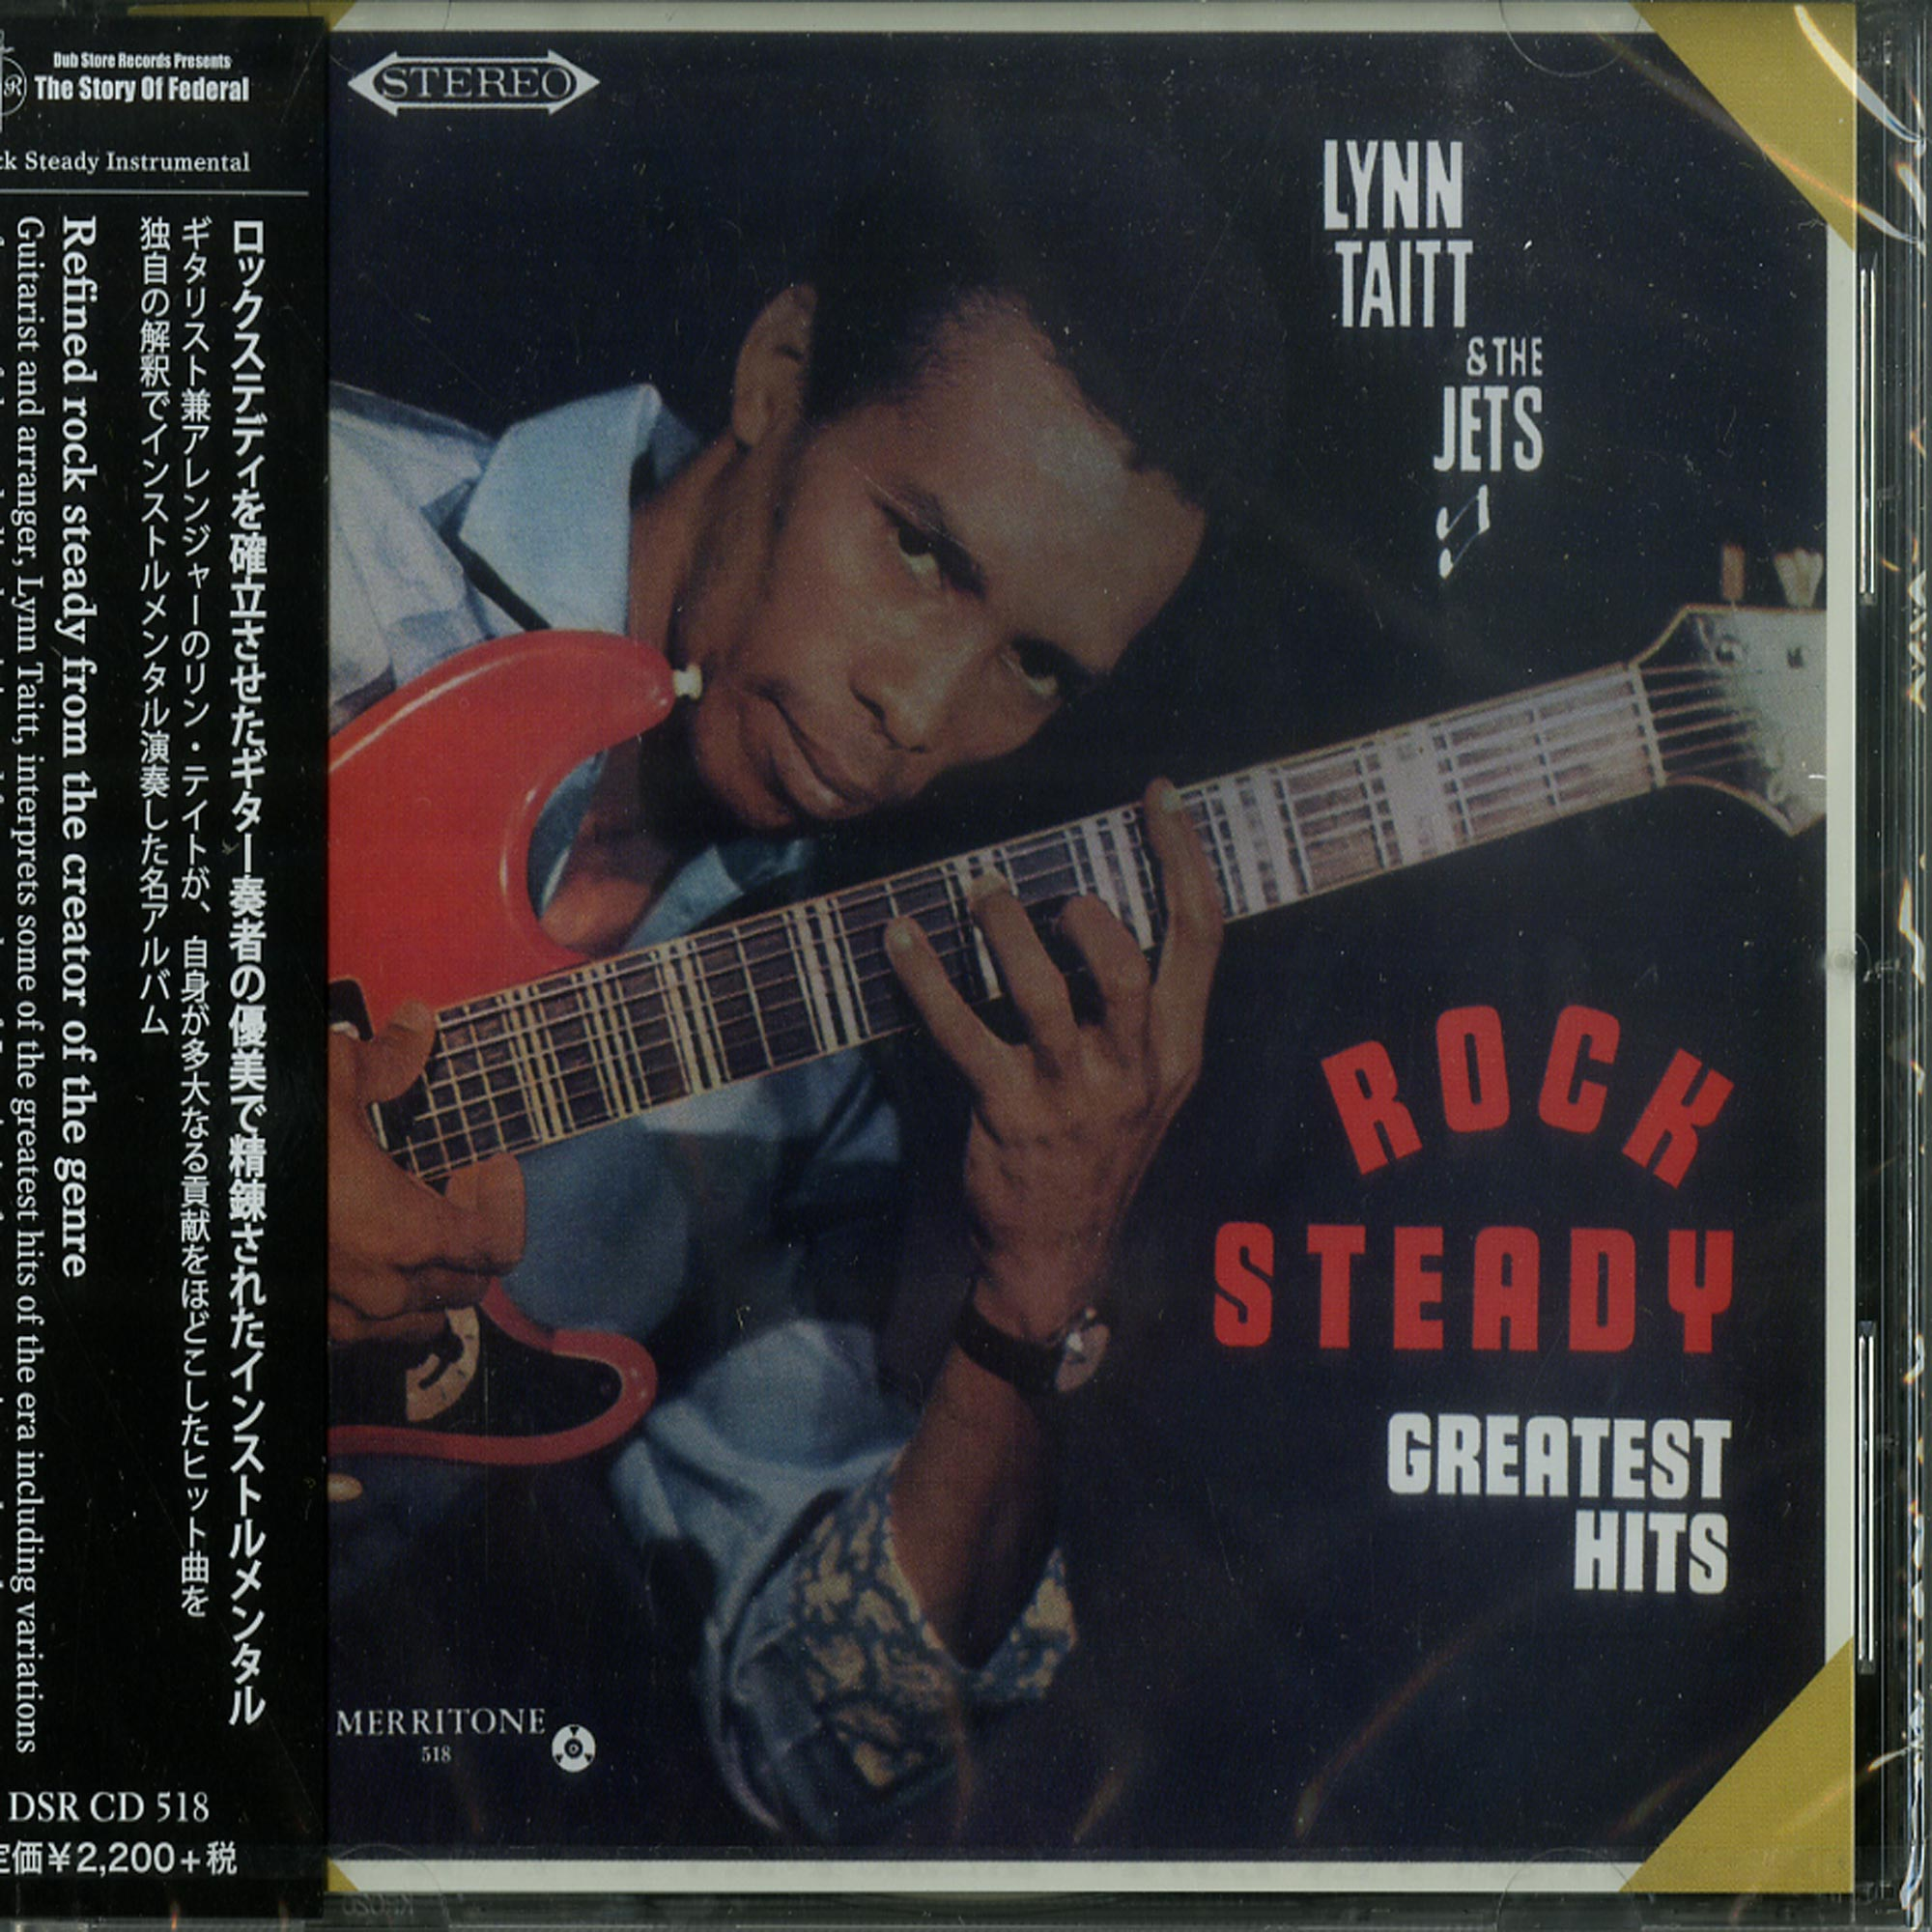 Lynn Taitt & The Jets - ROCK STEADY GREATEST HITS